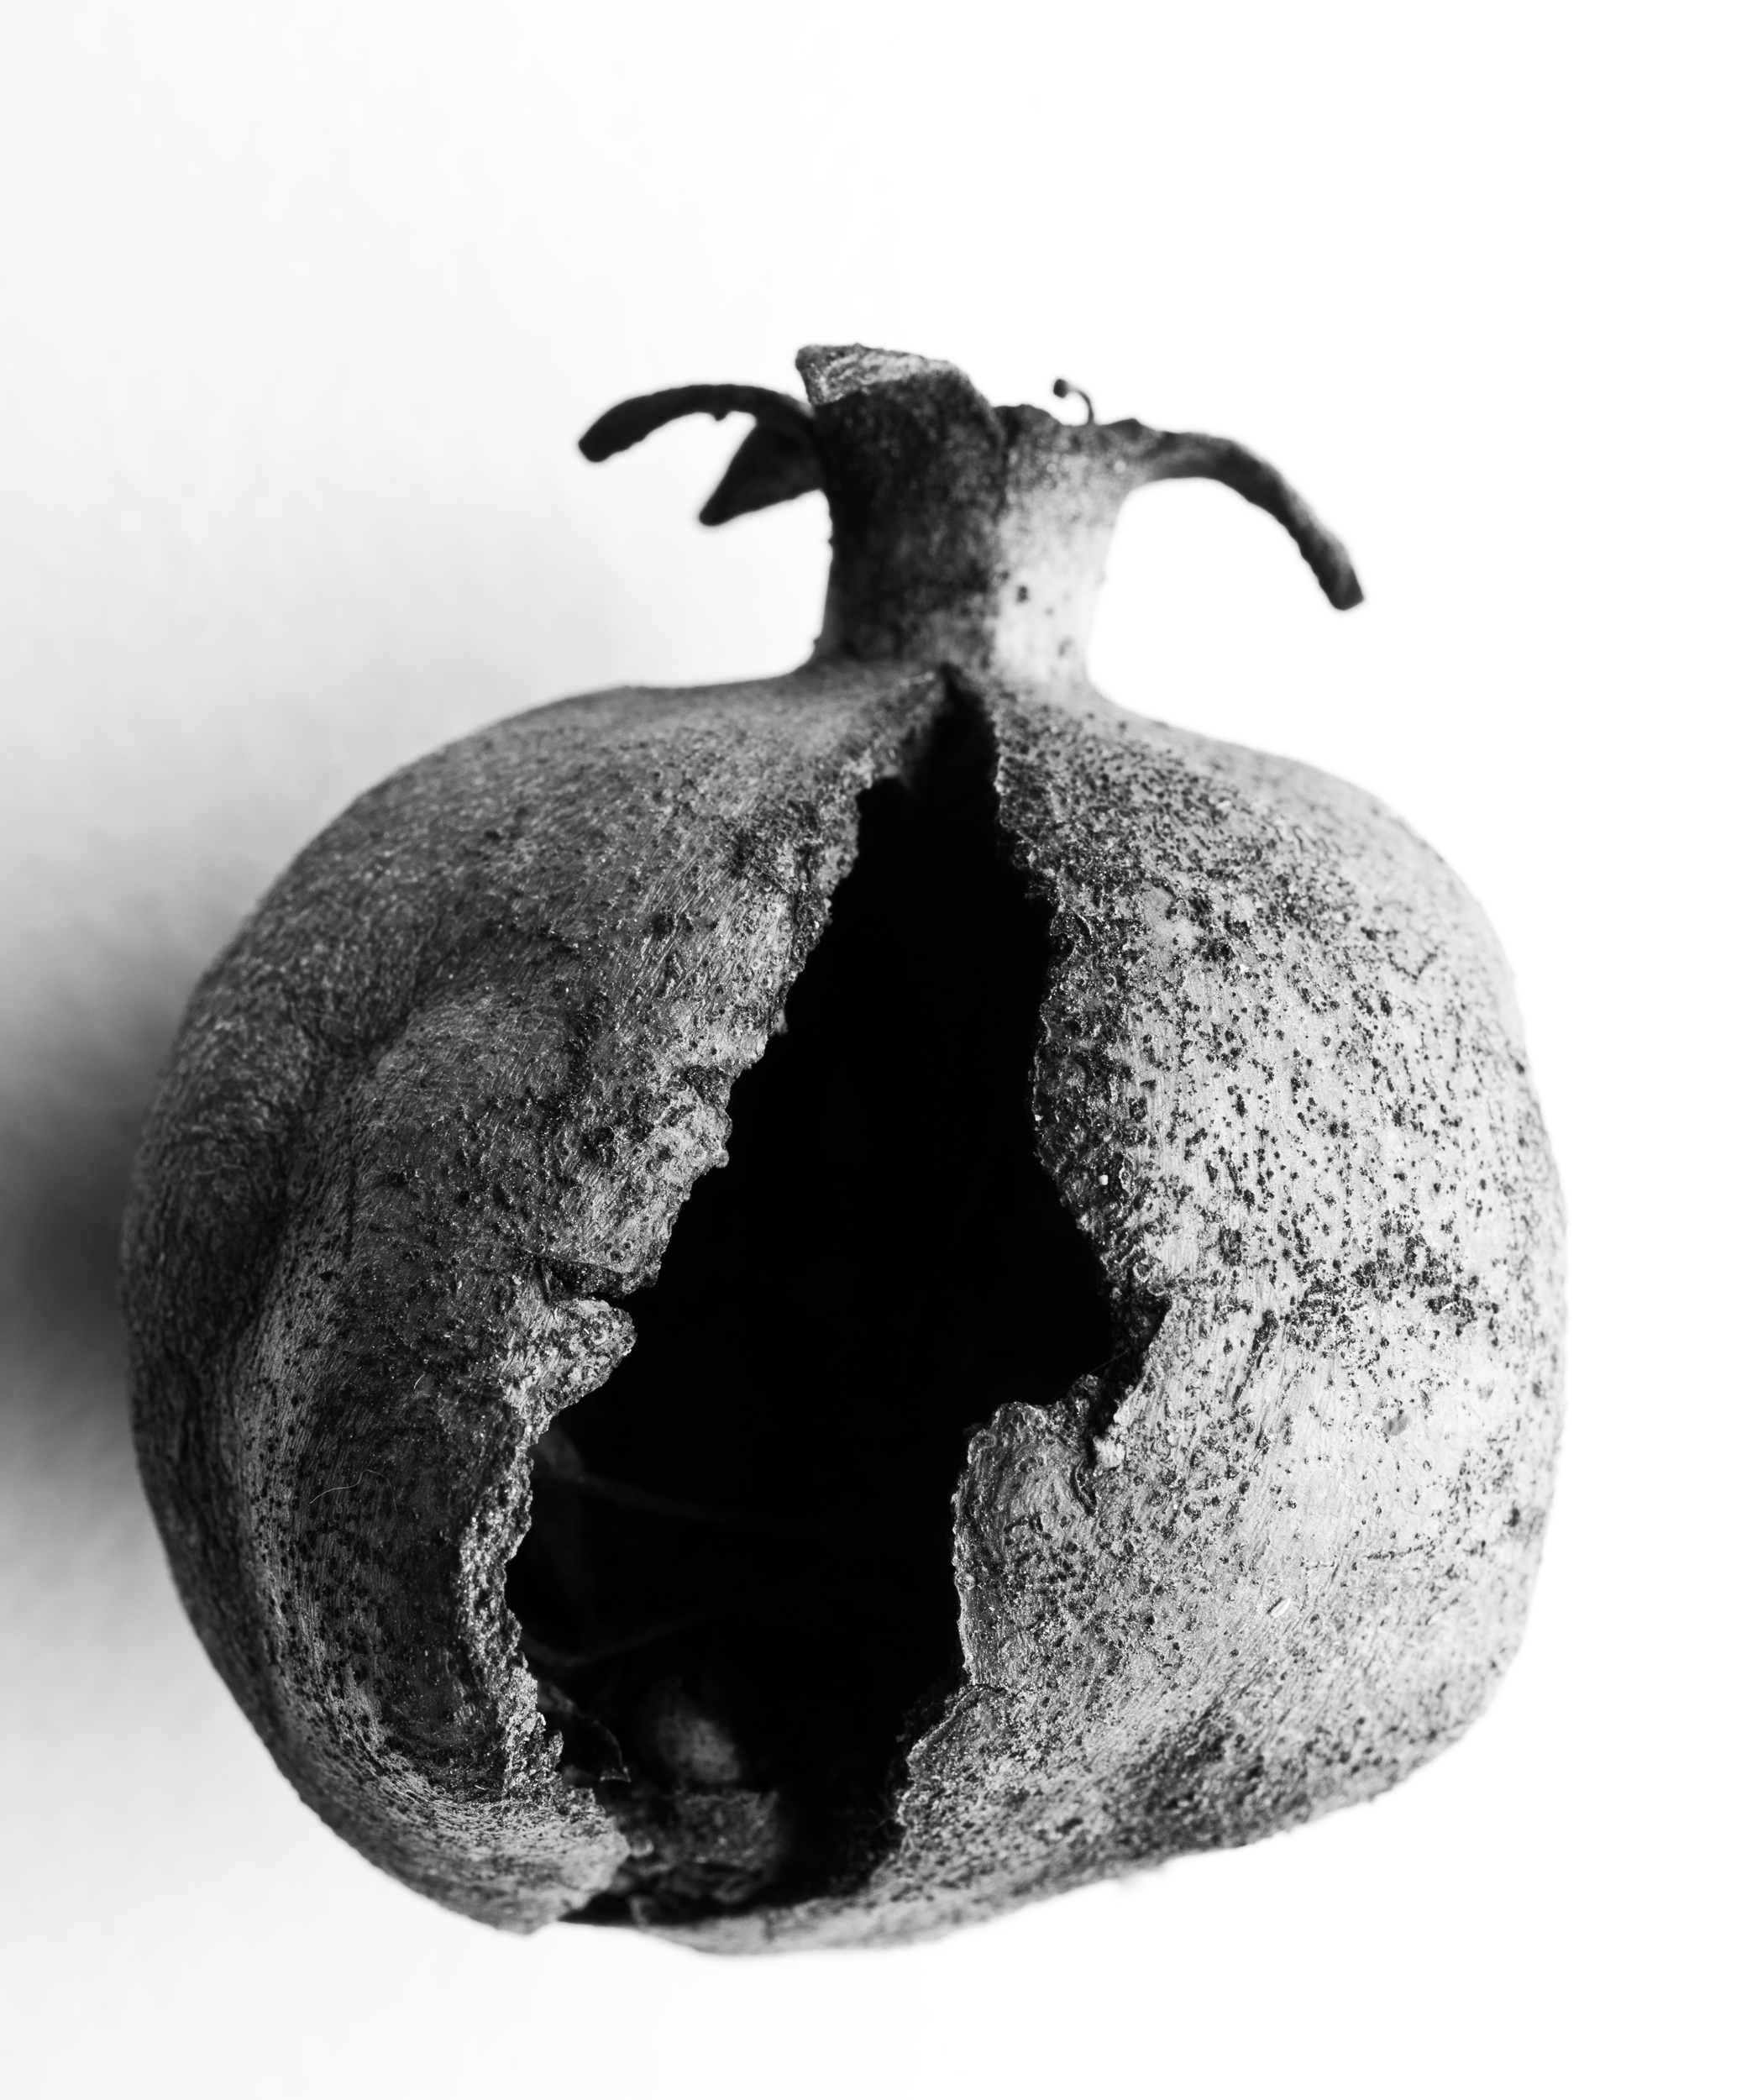 Pomegranate, cracked, 2016